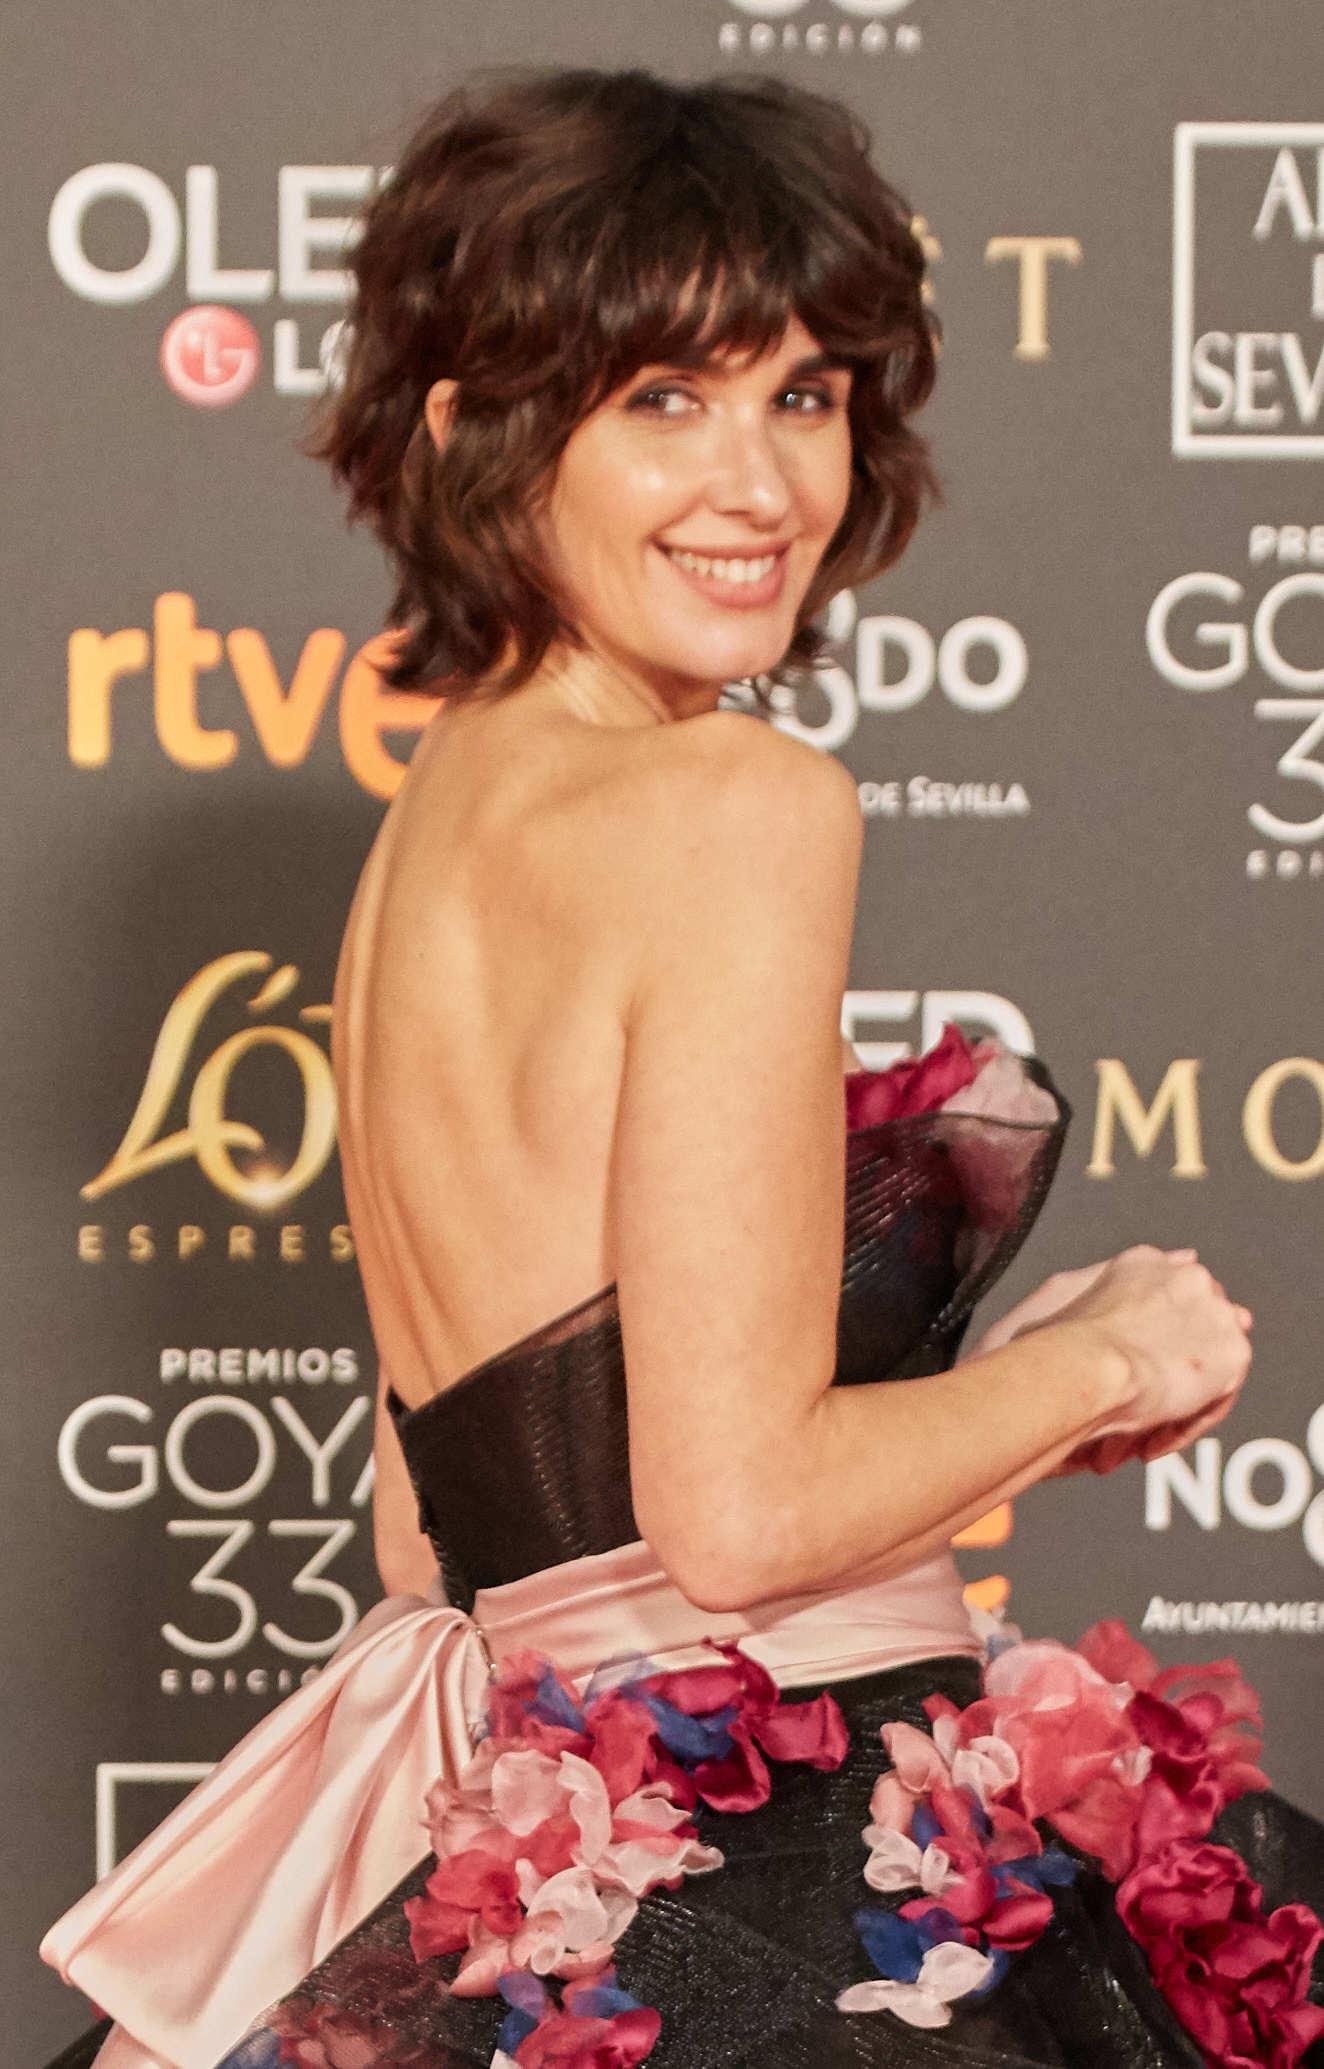 File:Premios Goya 2019 - Paz Vega (cropped) jpg - Wikimedia